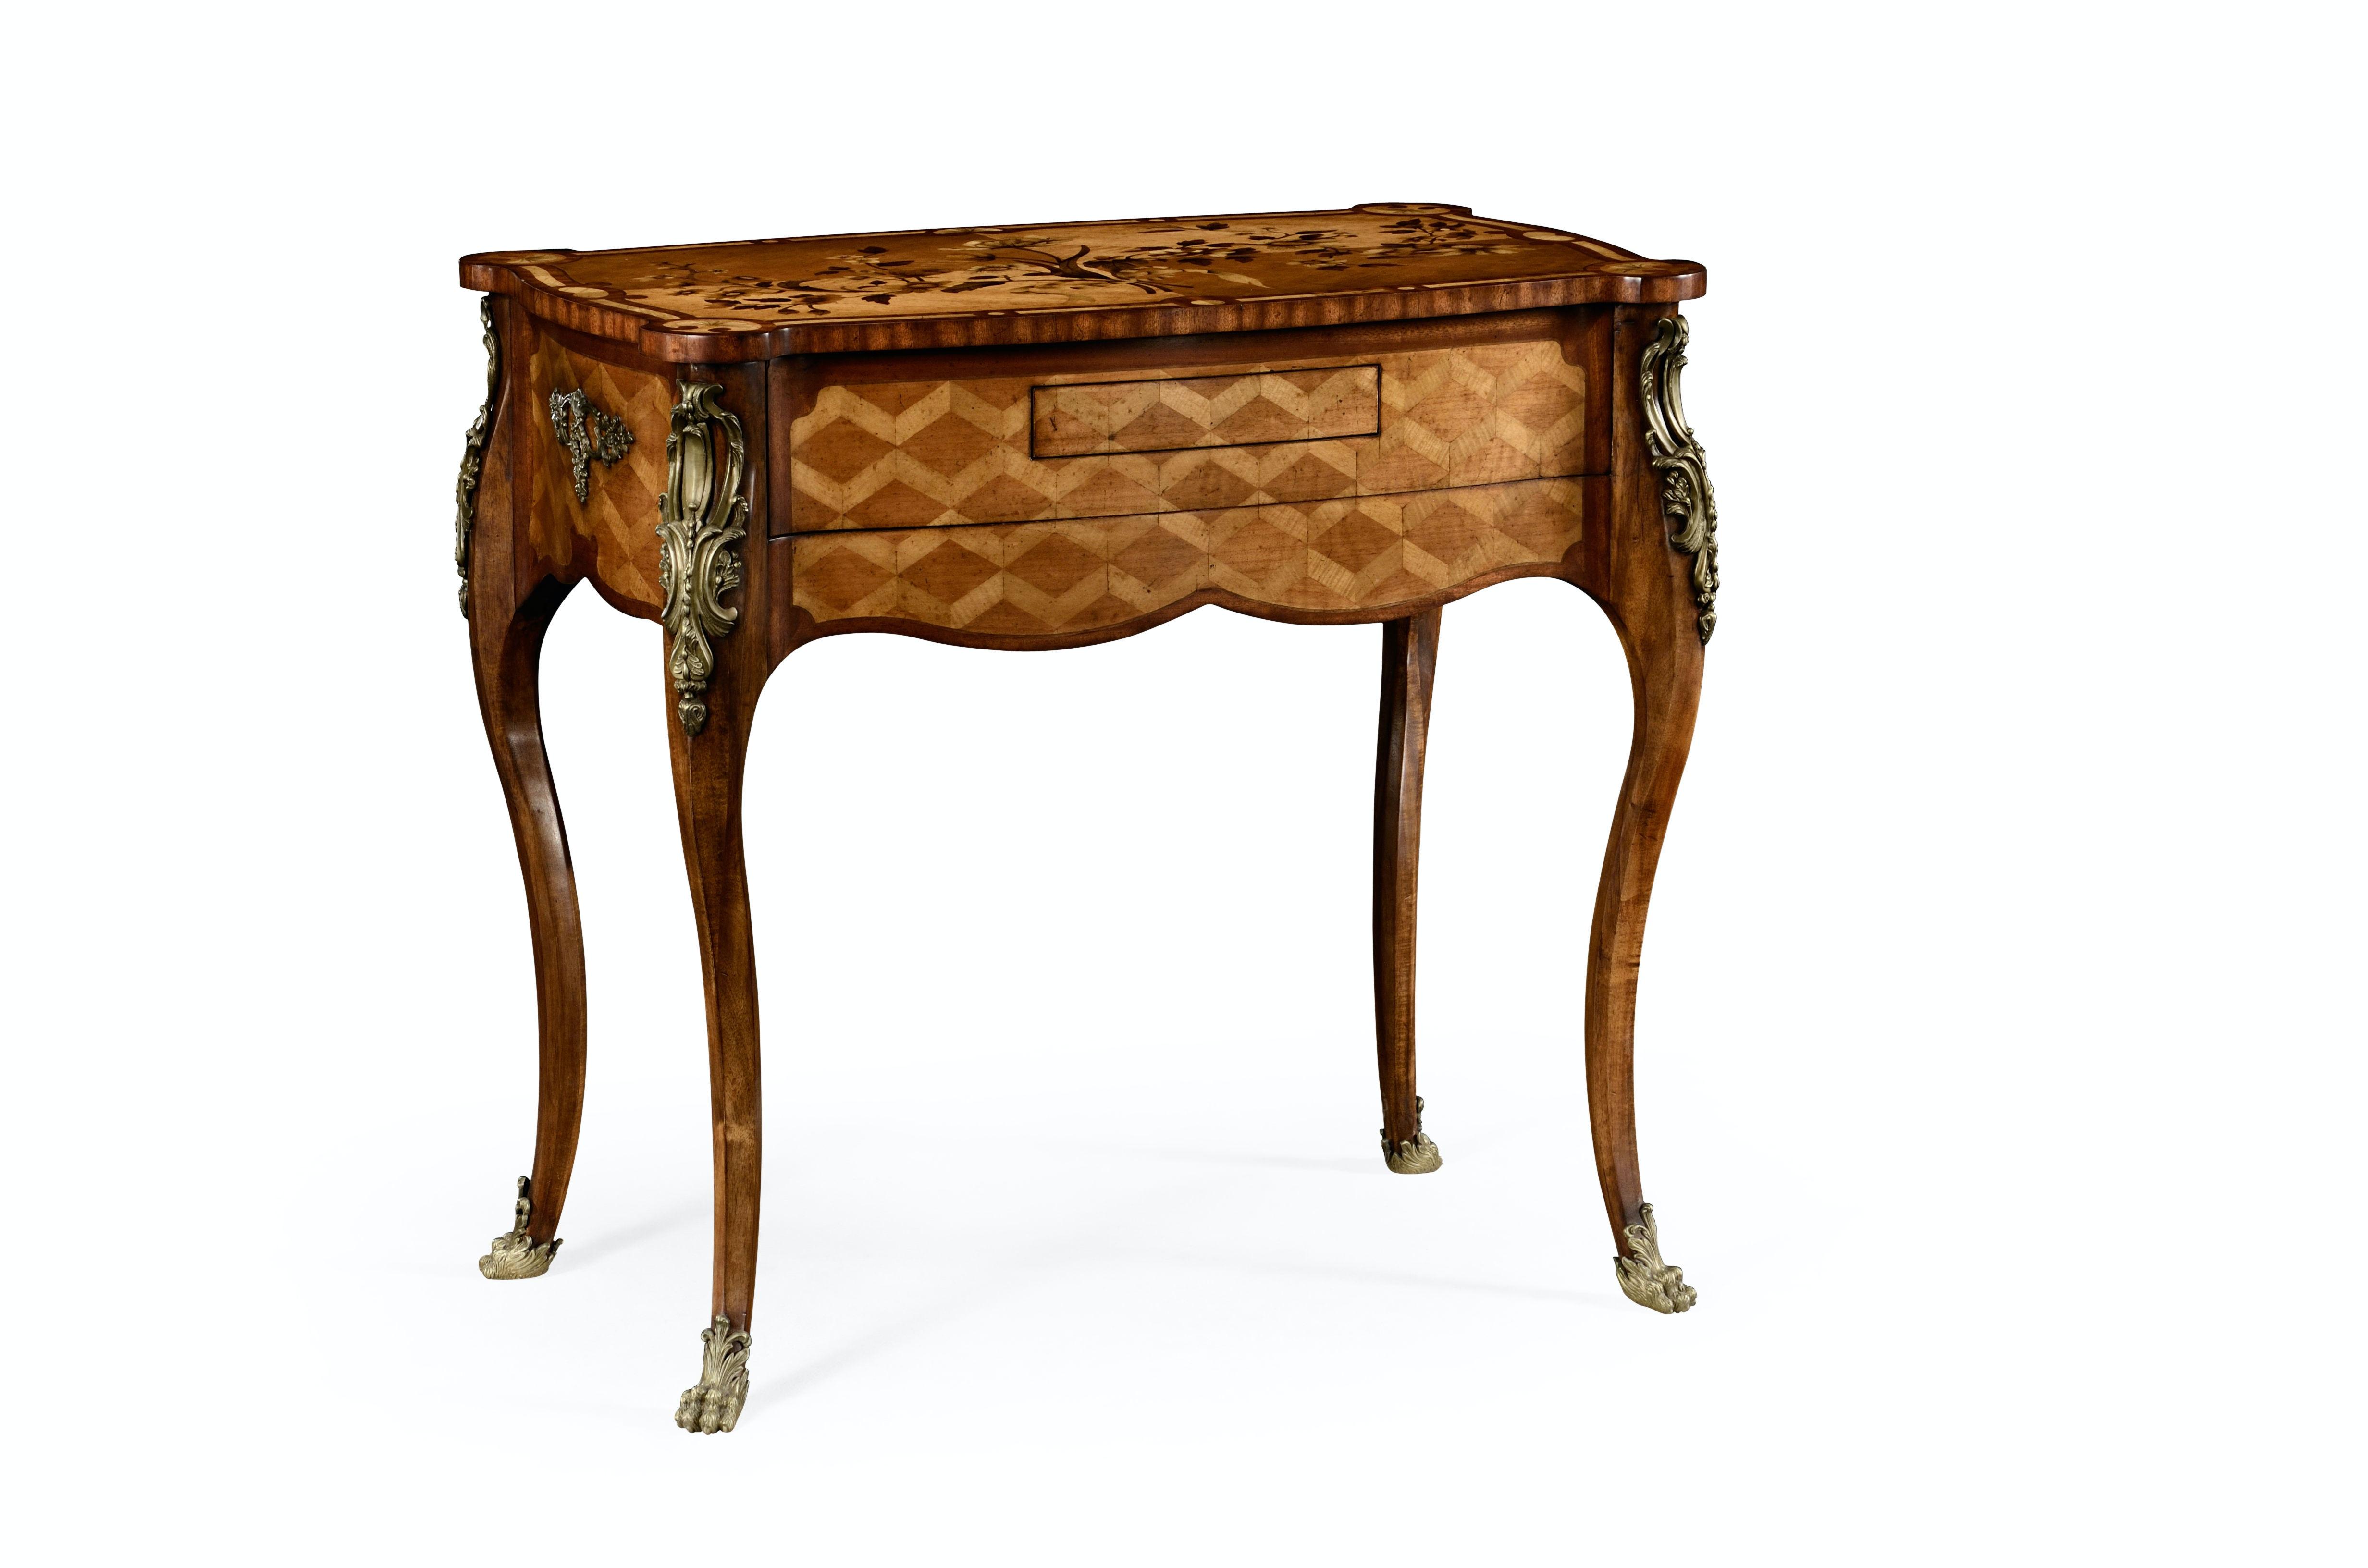 art deco style rosewood secretaire 494335. louis xv style mechanical writing table 494553sal art deco rosewood secretaire 494335 e